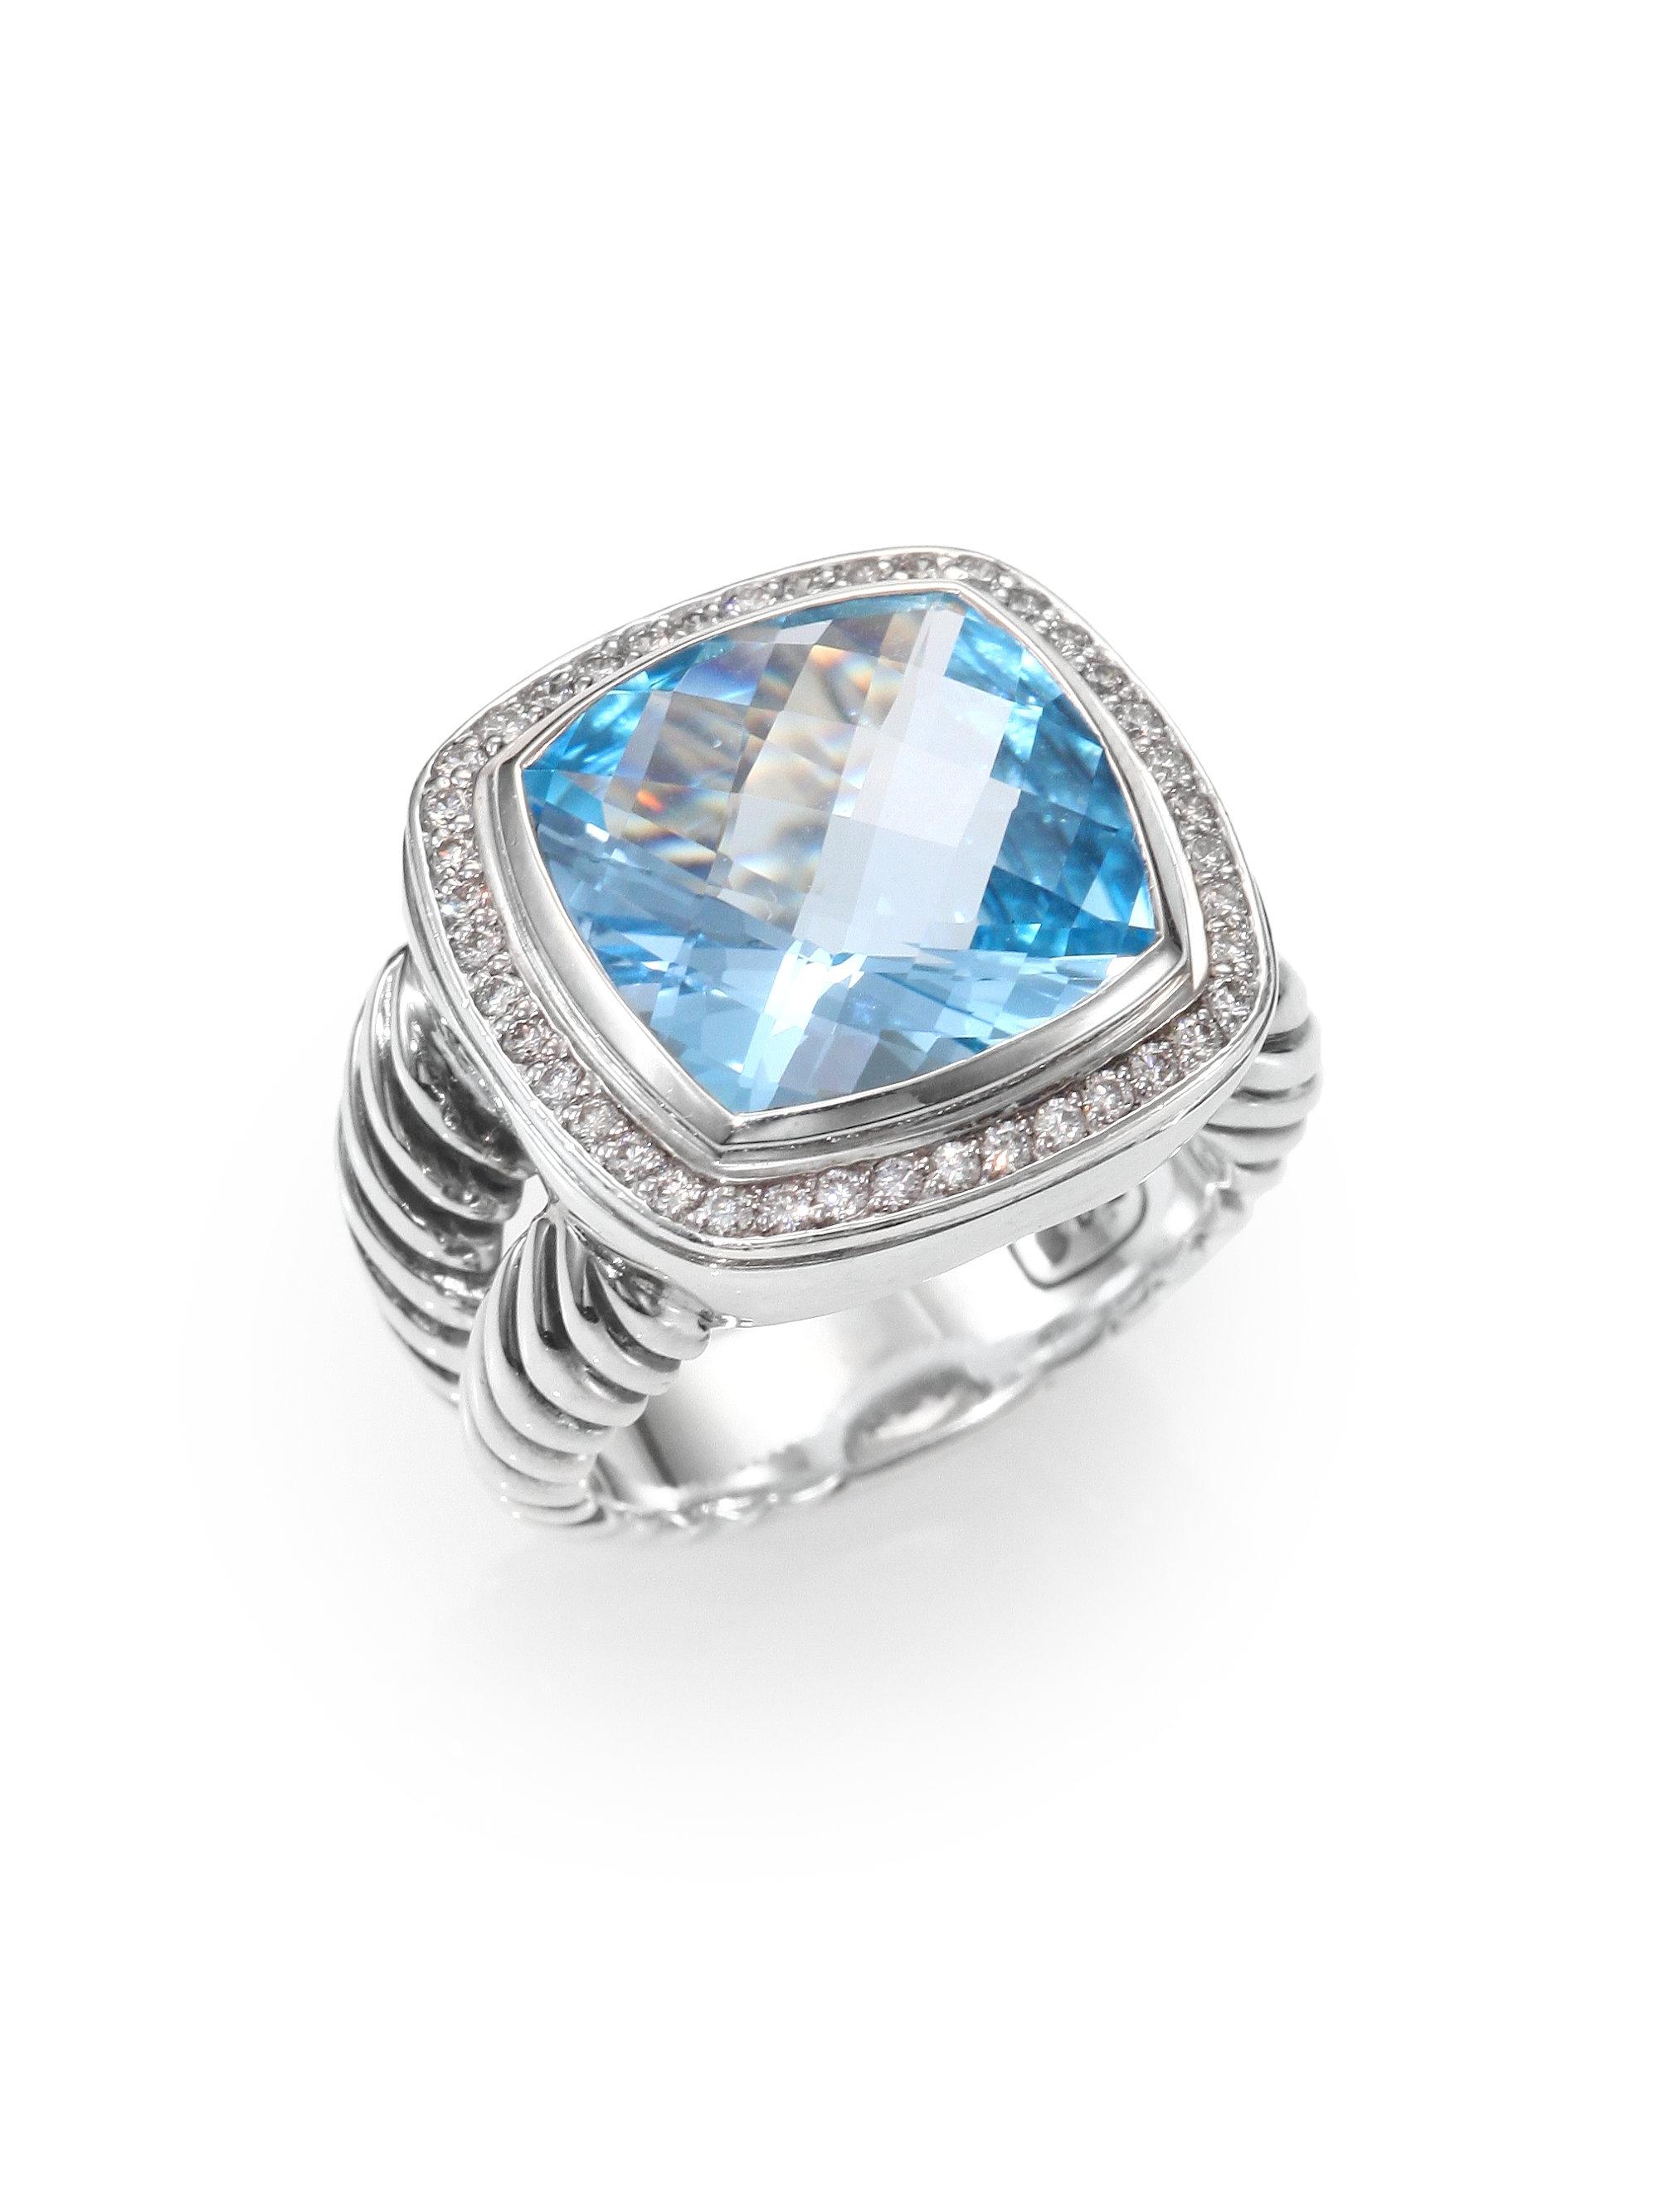 david yurman blue topaz diamond sterling silver ring in. Black Bedroom Furniture Sets. Home Design Ideas